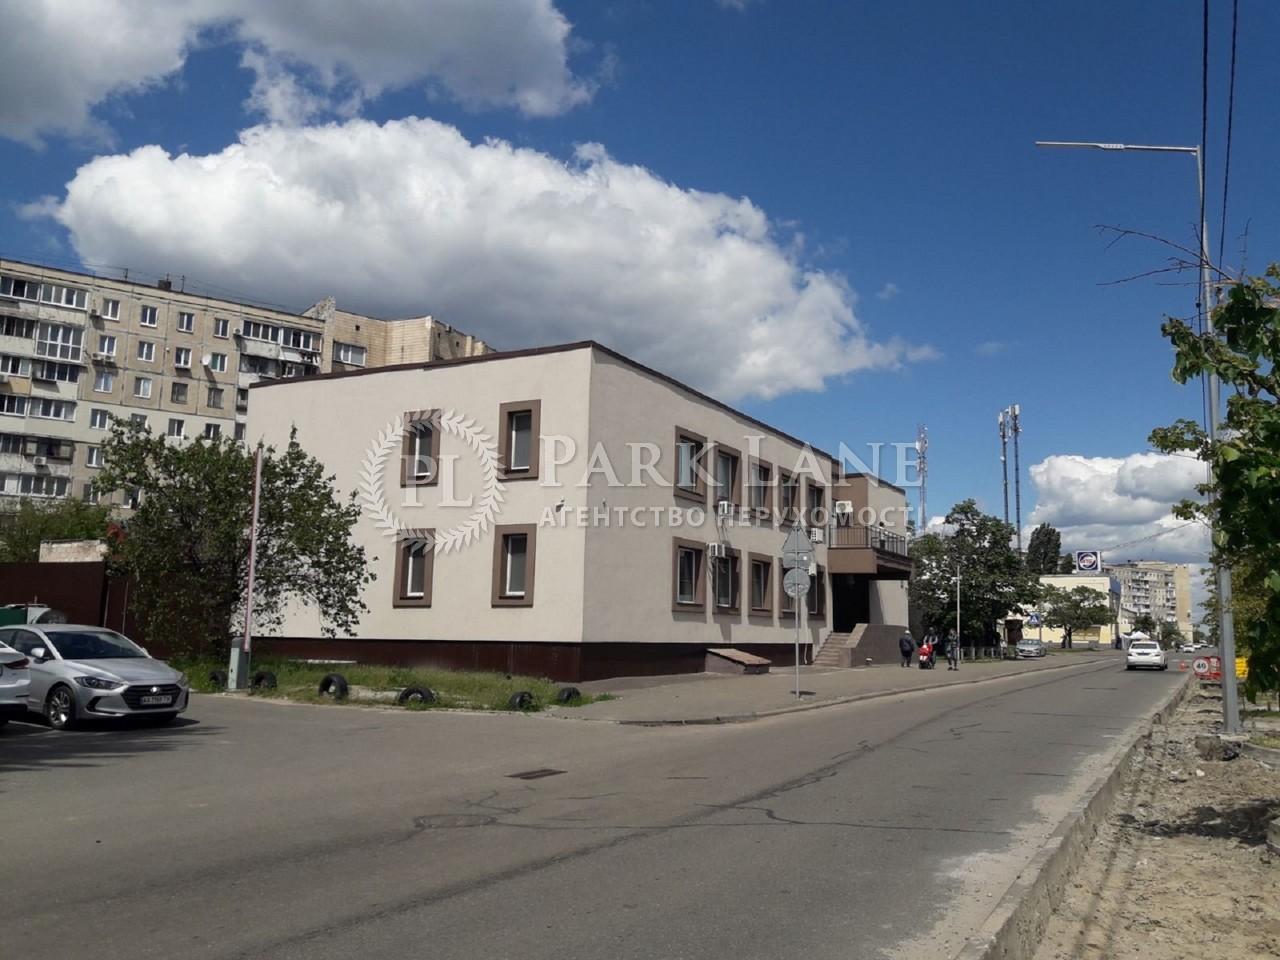 Будинок, B-100373, Прирічна, Київ - Фото 1